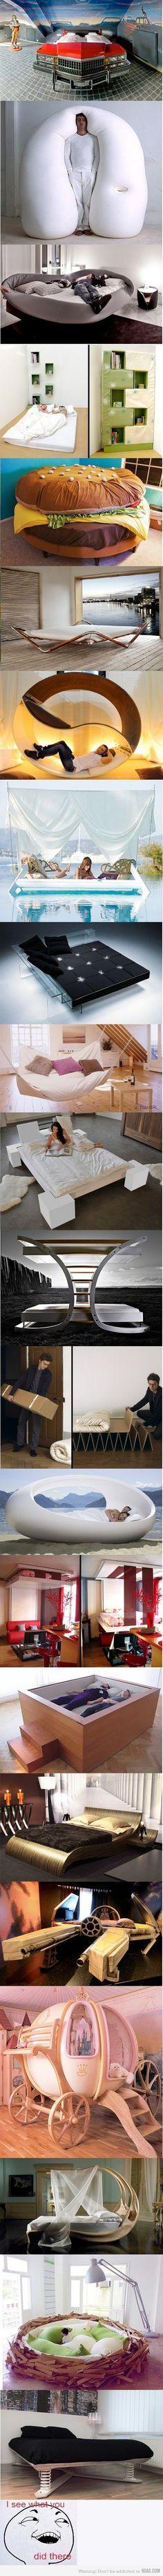 Bed lvl: creative